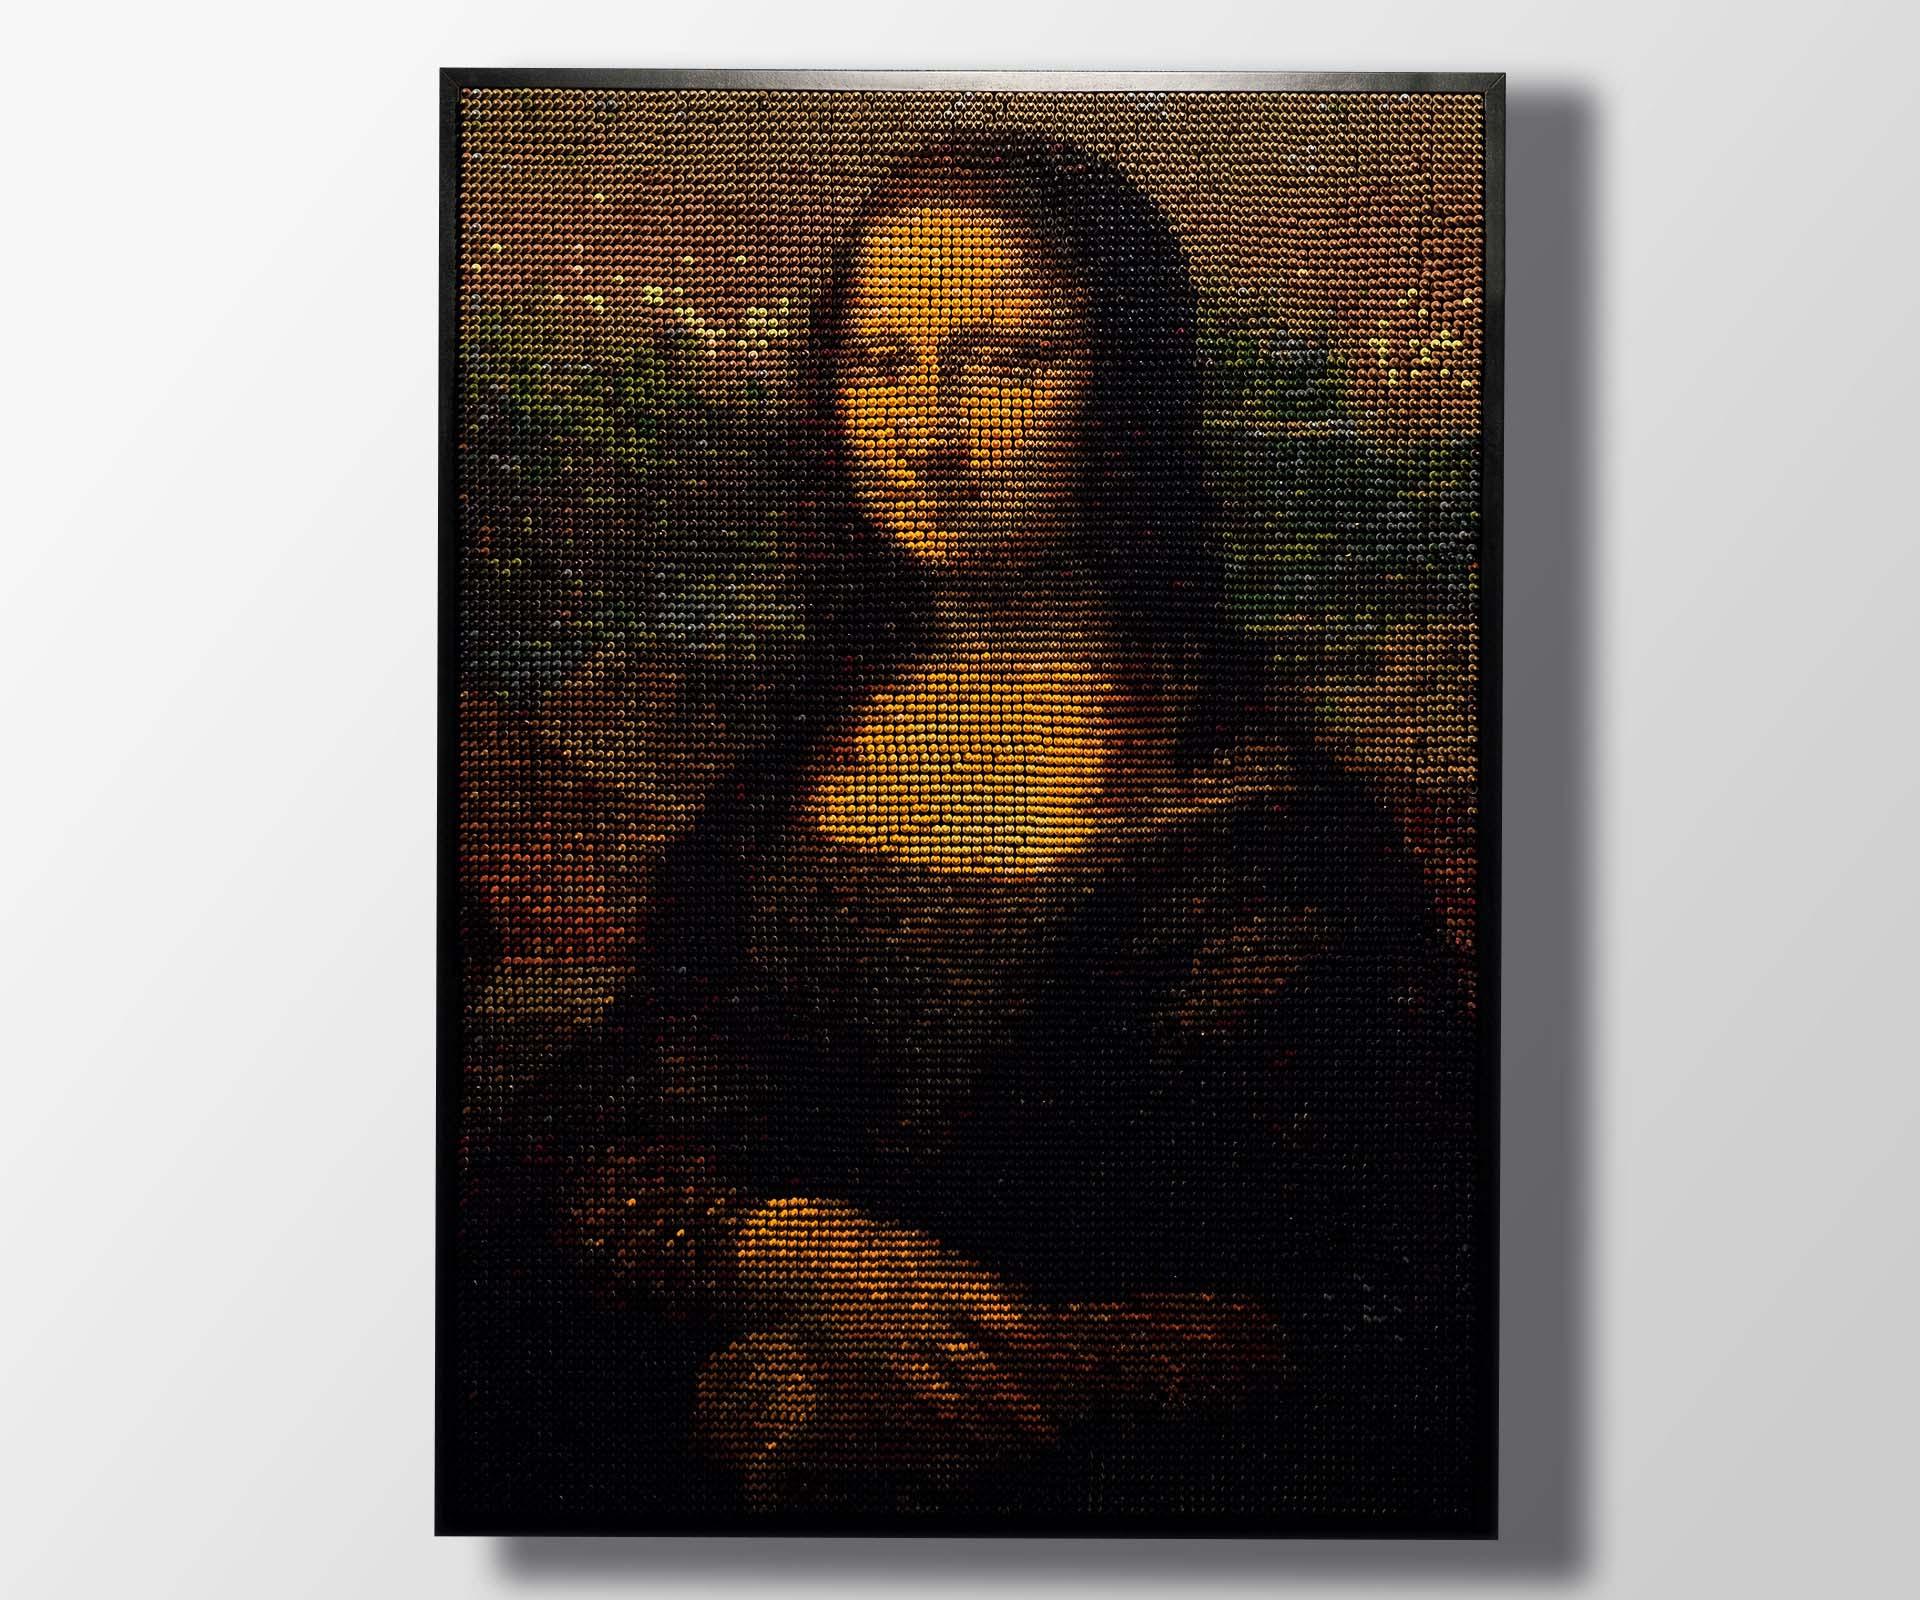 Color.Works reimagines Mona Lisa